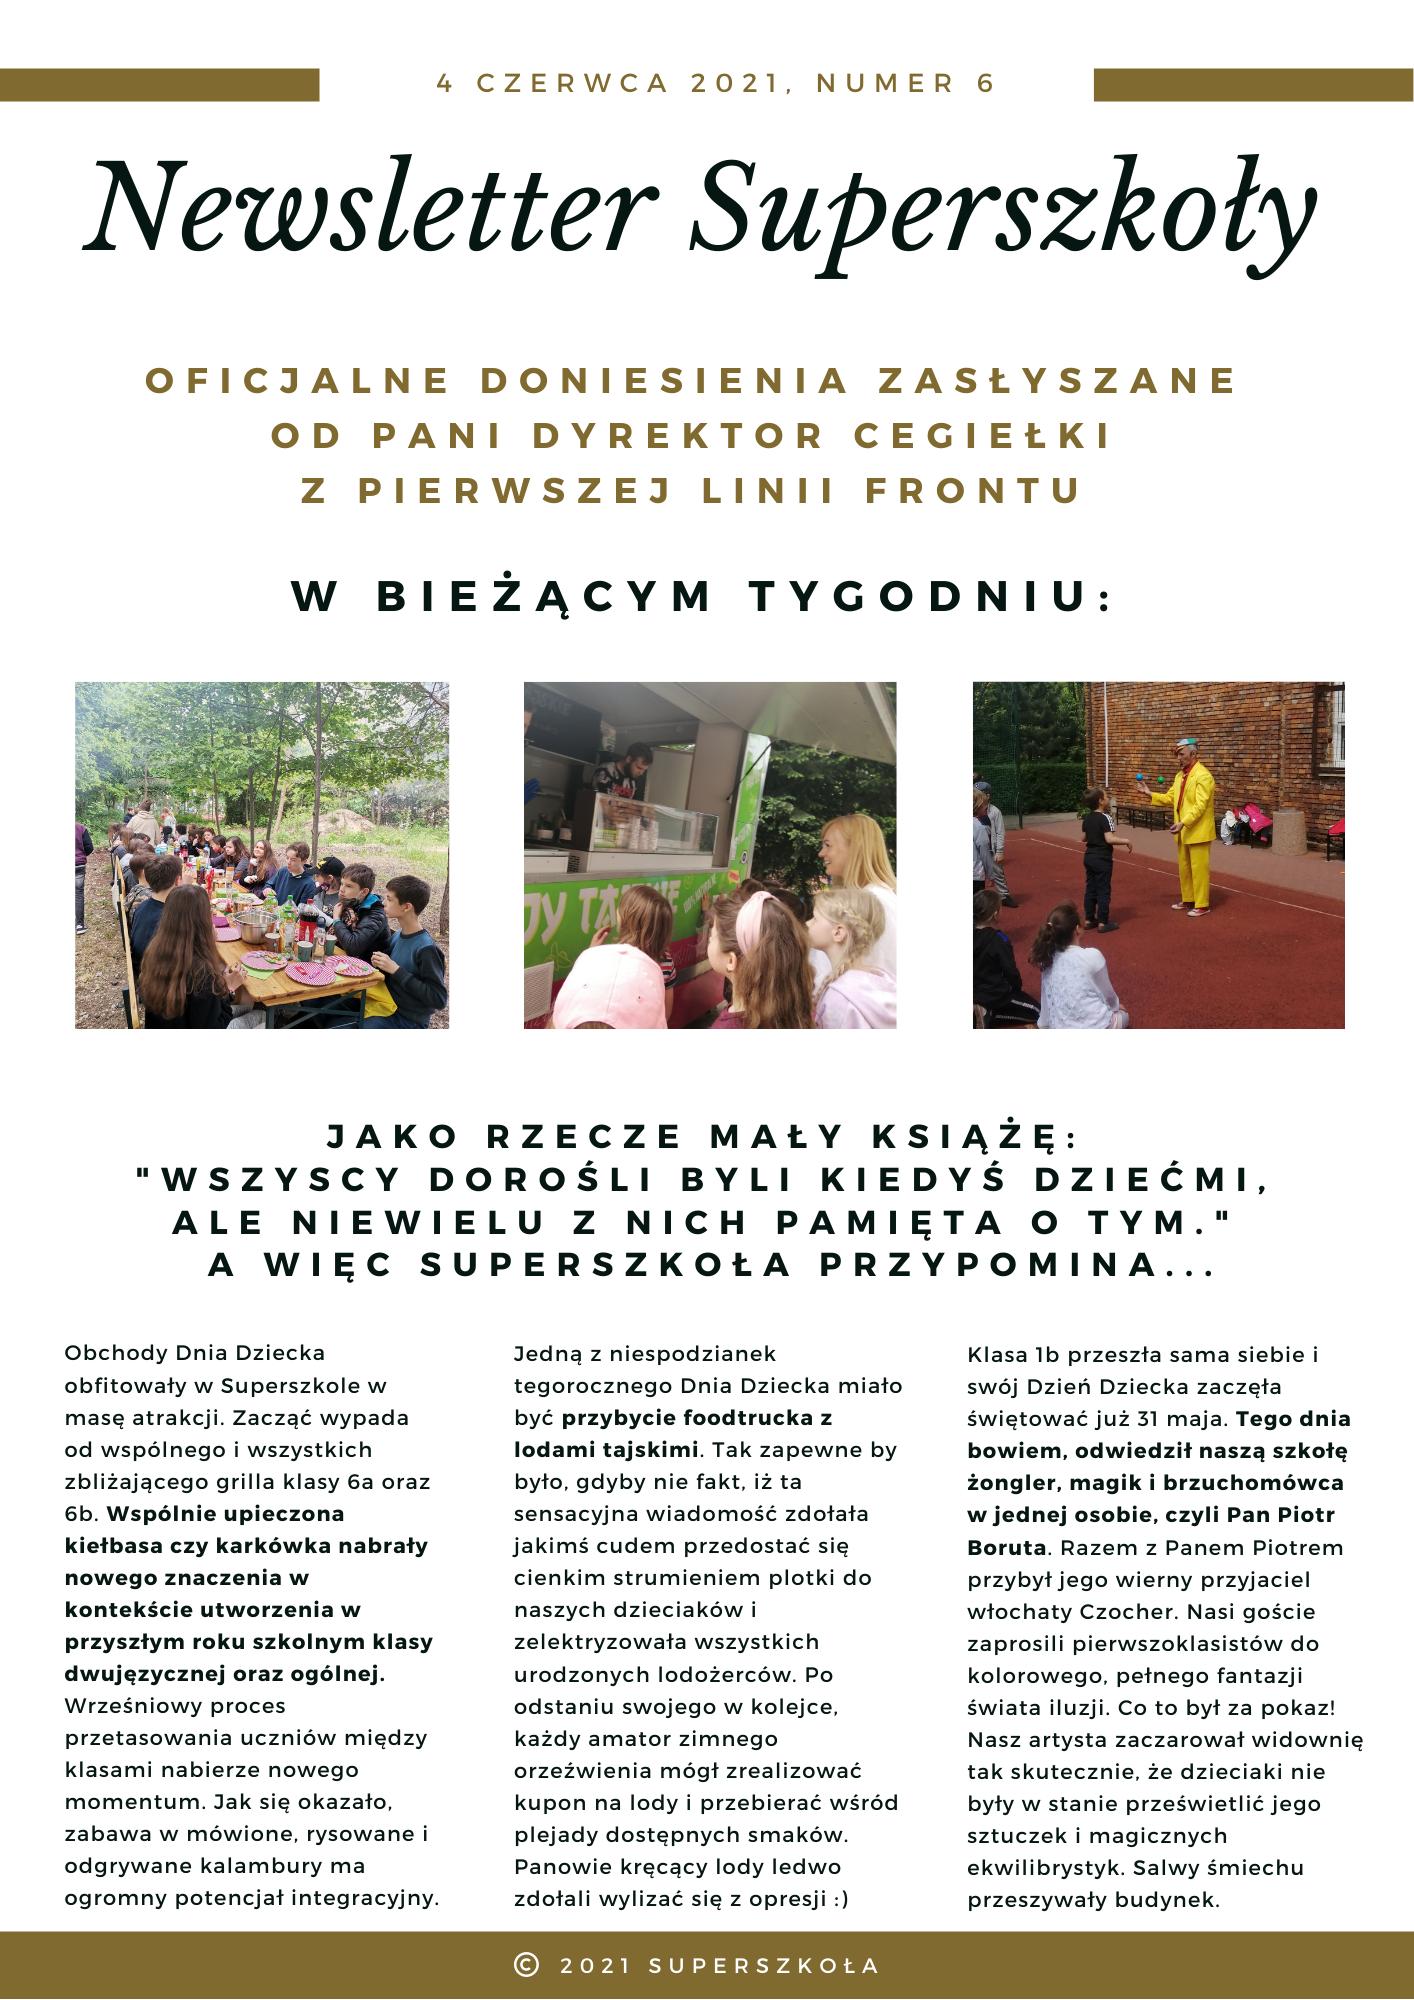 Newsletter_Superszkoły_6